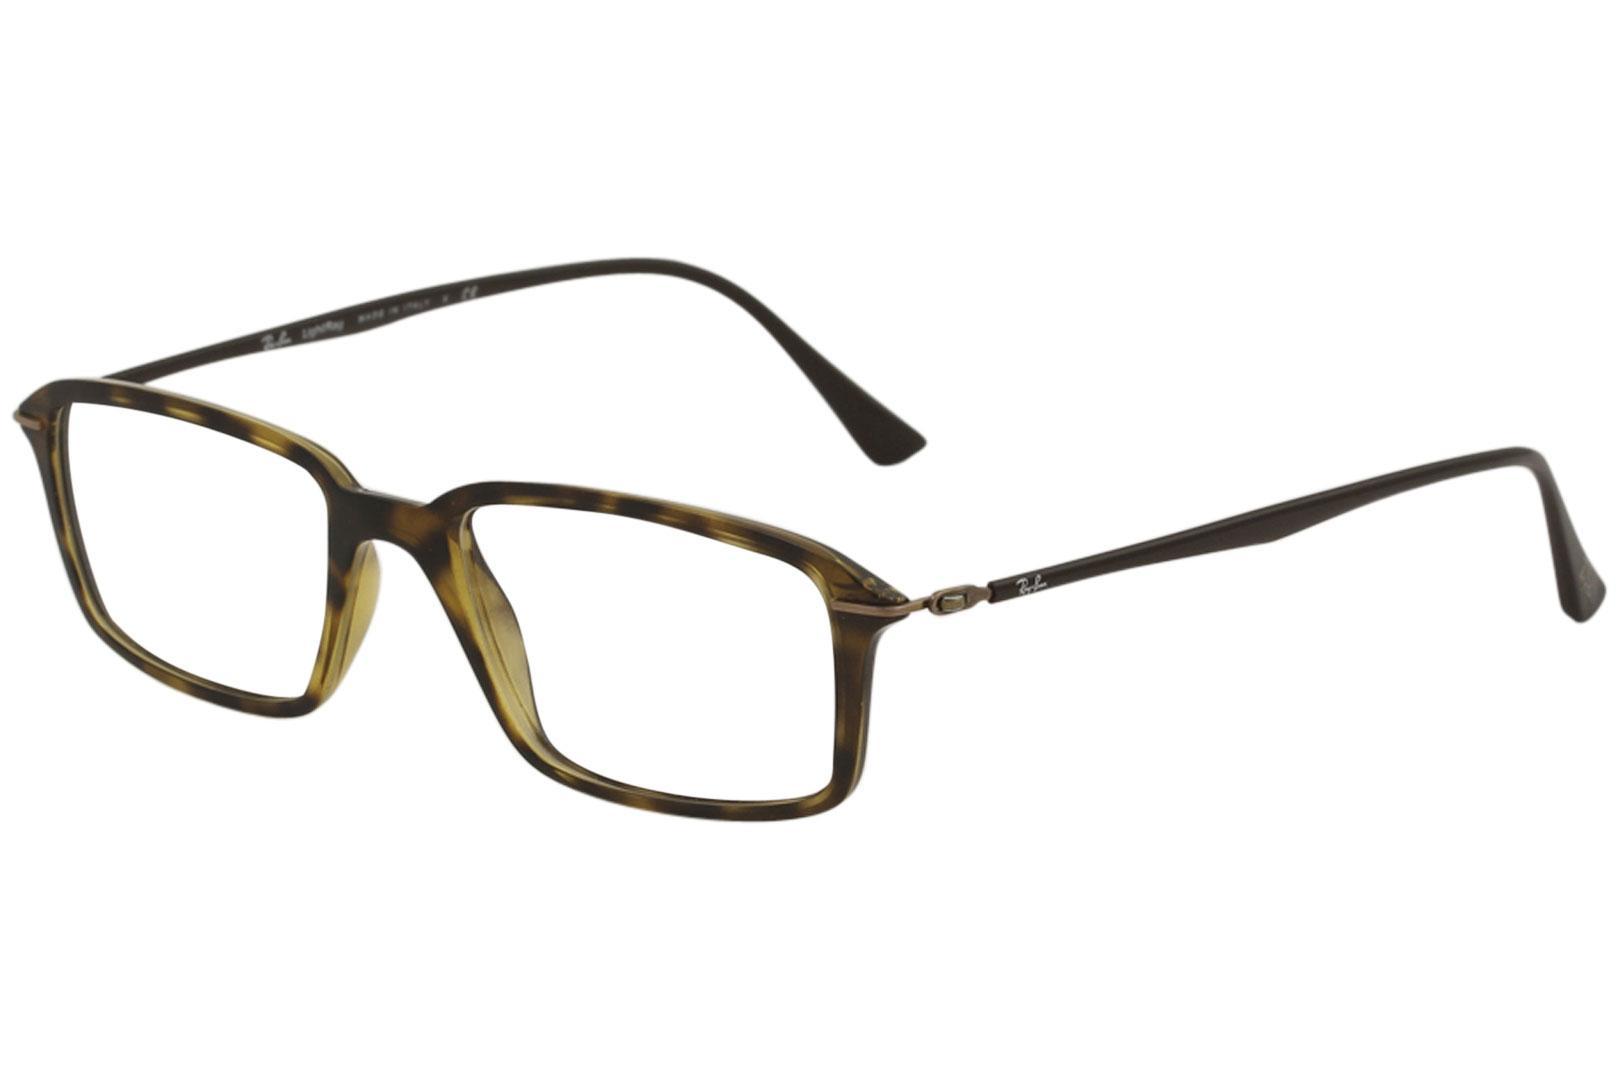 ab5bb7f59cce Ray Ban Men s LightRay Eyeglasses RX7019 RX 7019 RayBan Full Rim Optical  Frame by Ray Ban. 12345